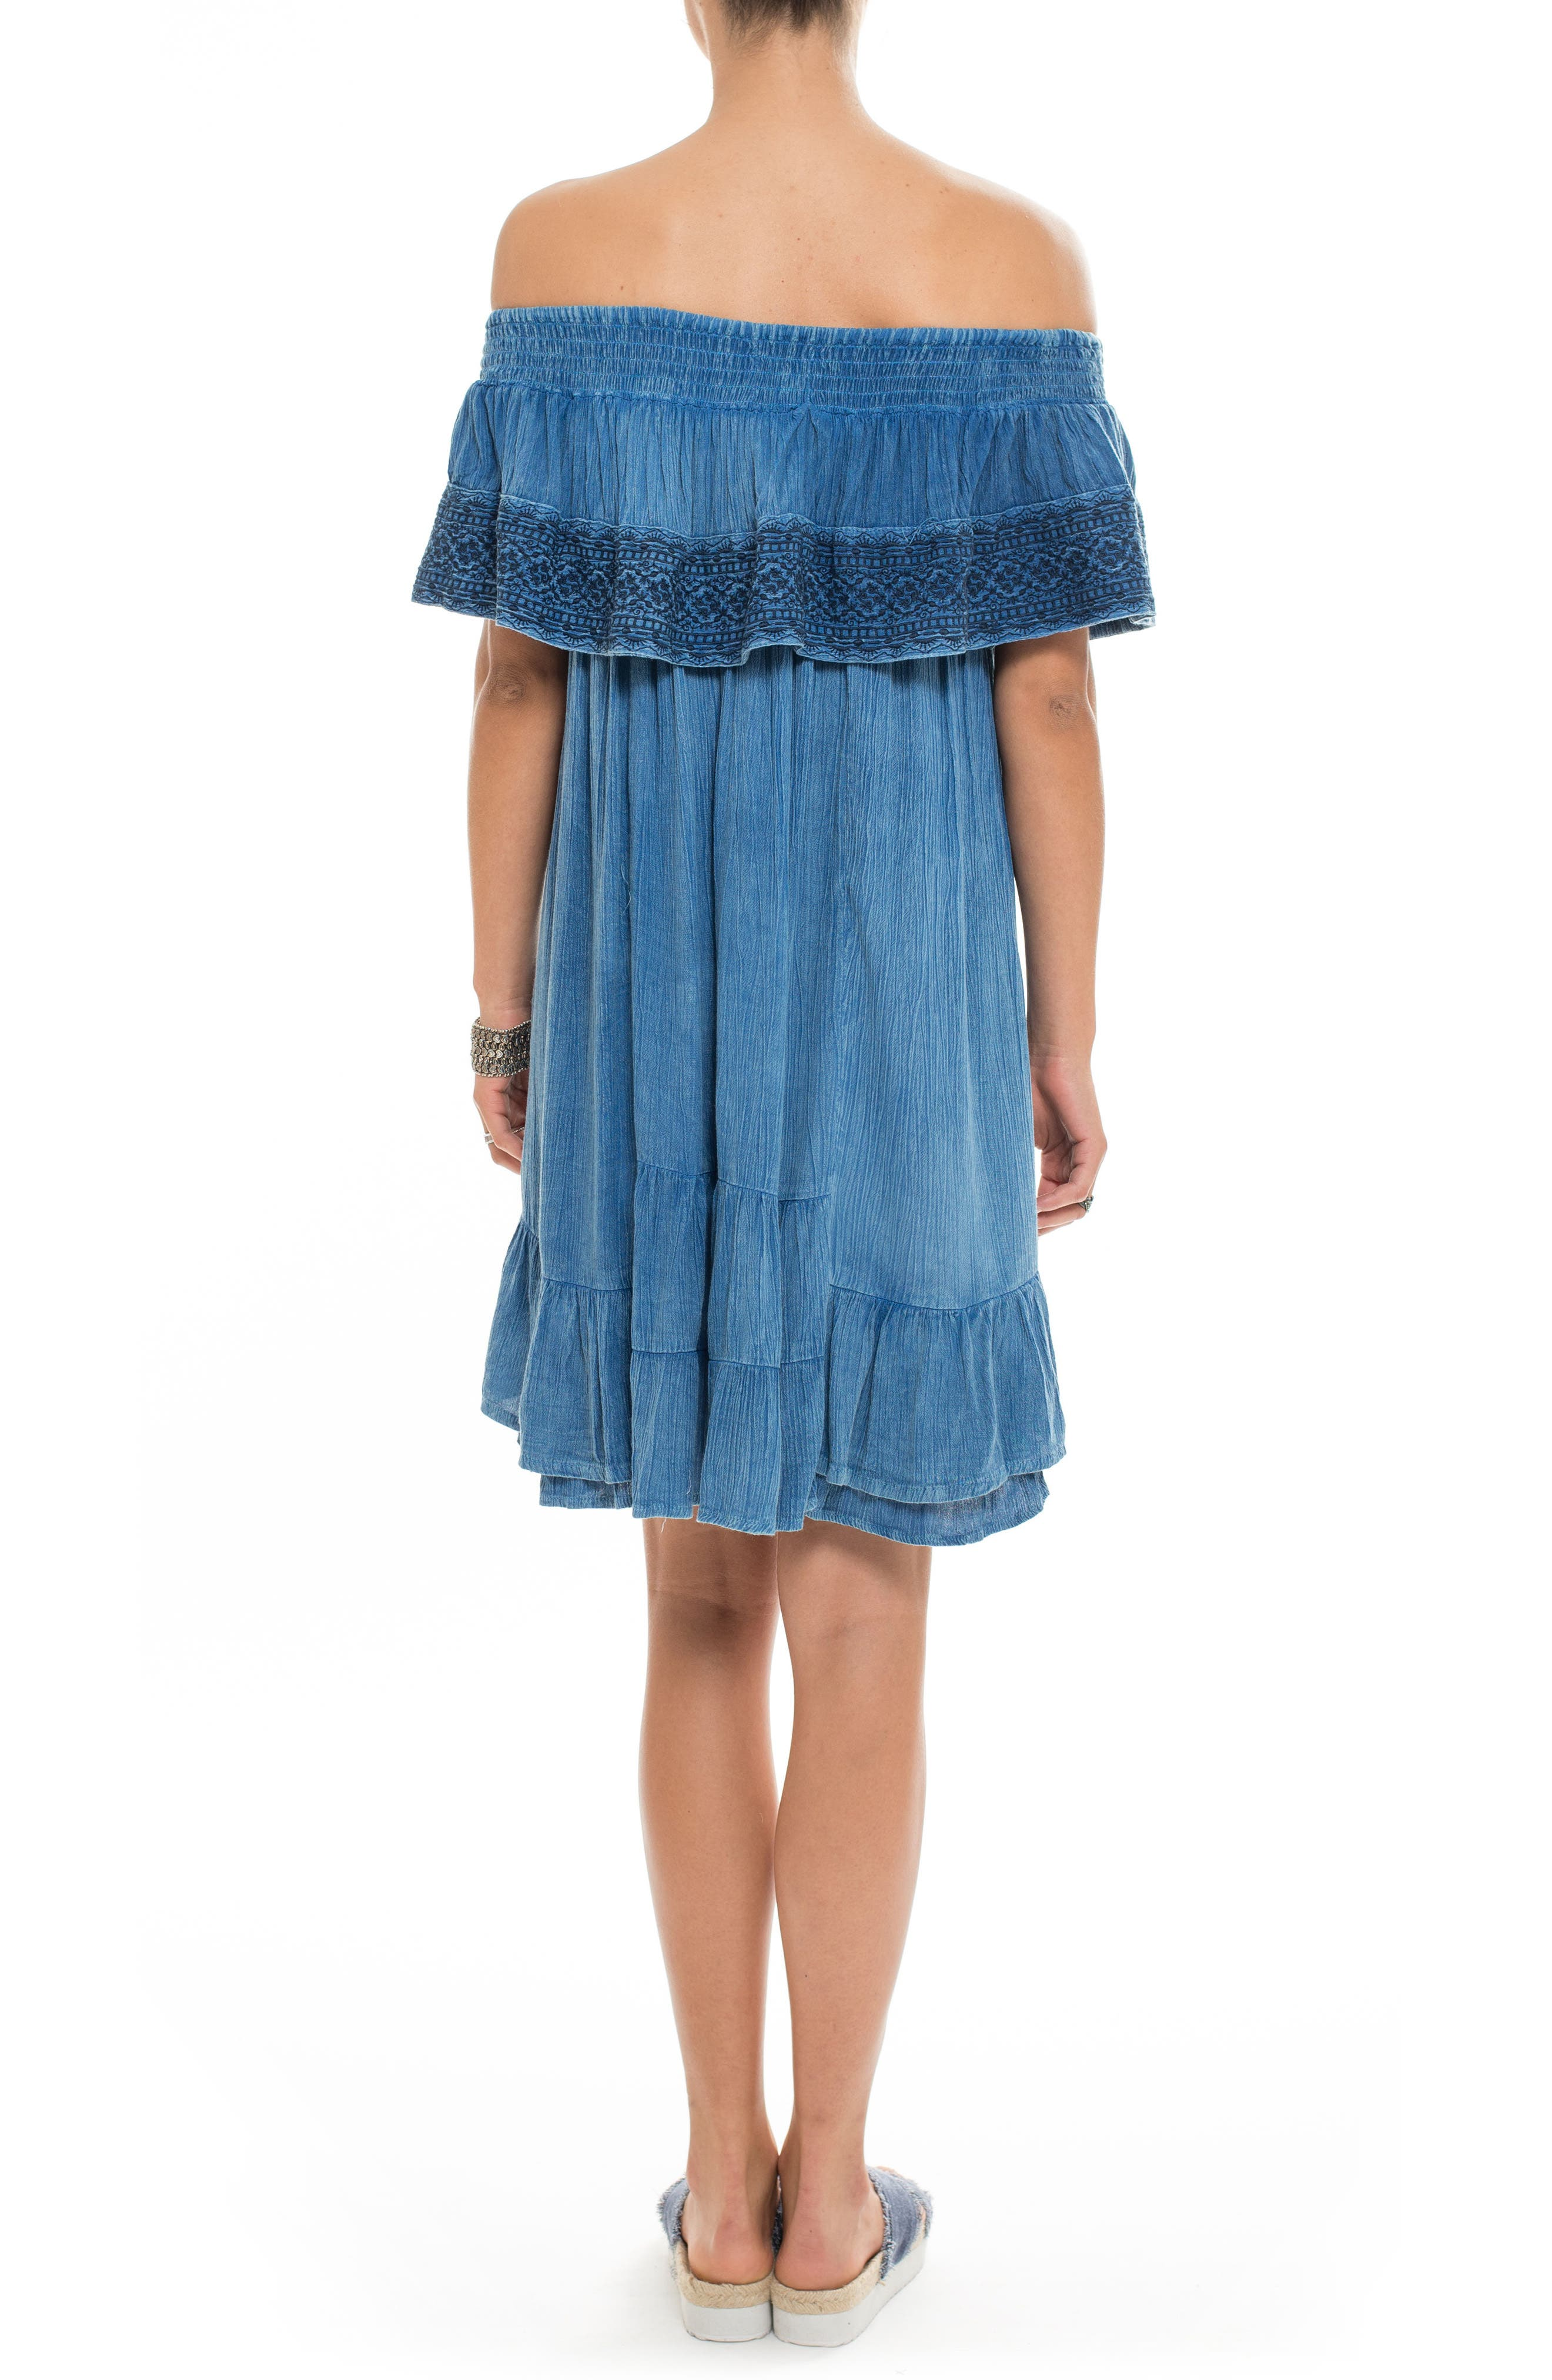 Alternate Image 2  - Muche et Muchette Gavin Ruffle Cover-Up Dress